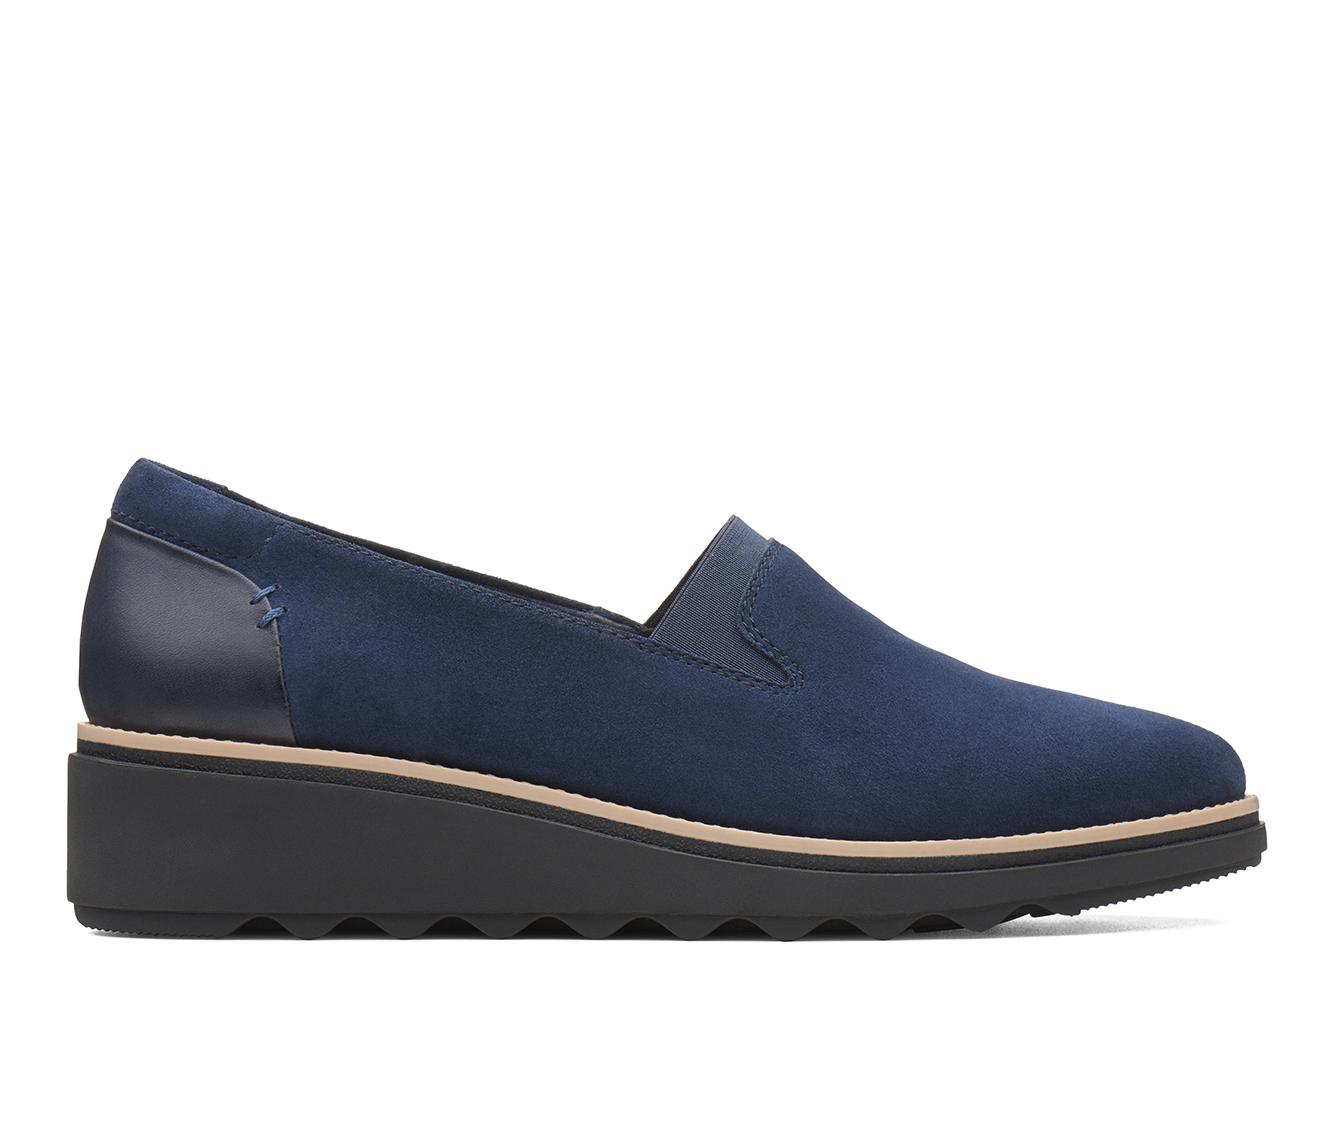 Clarks Sharon Dolly Women's Shoe (Blue Suede)